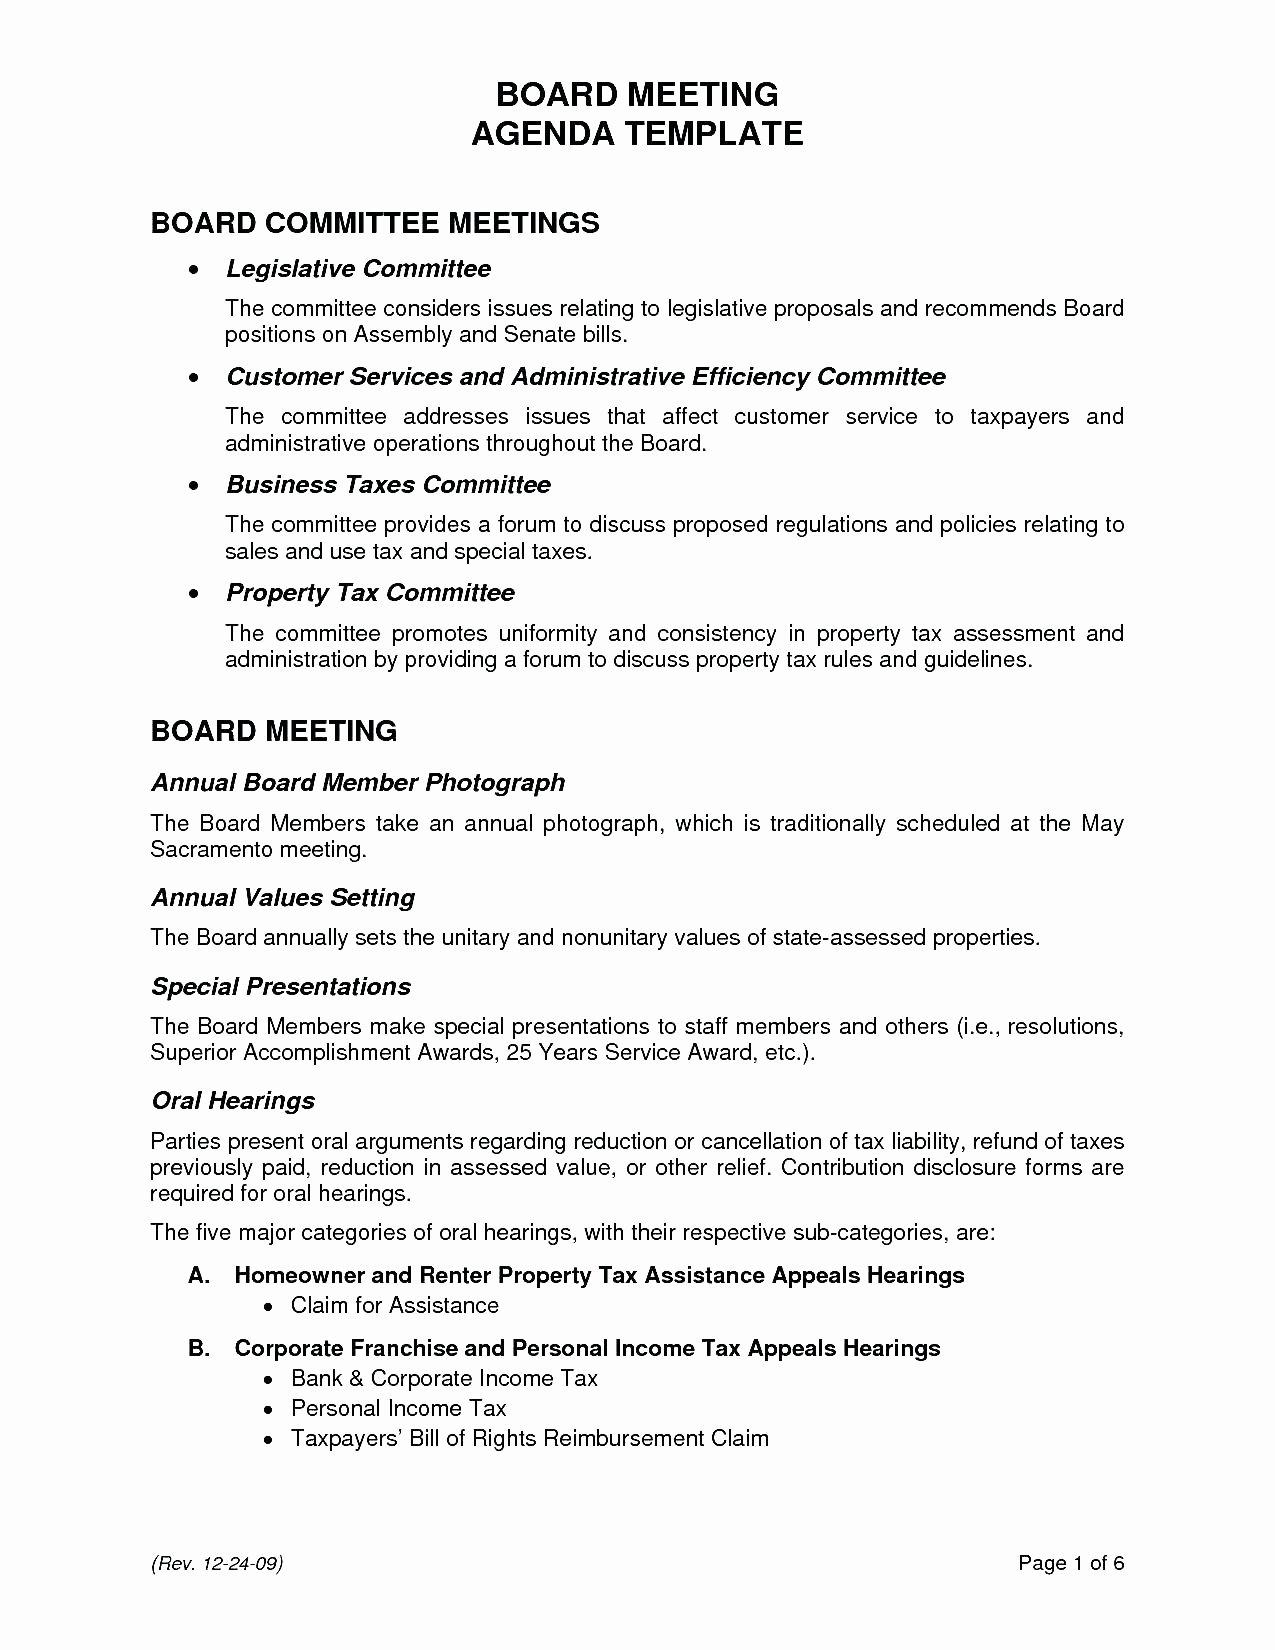 96 Project Kickoff Meeting Agenda Sample News Tips and